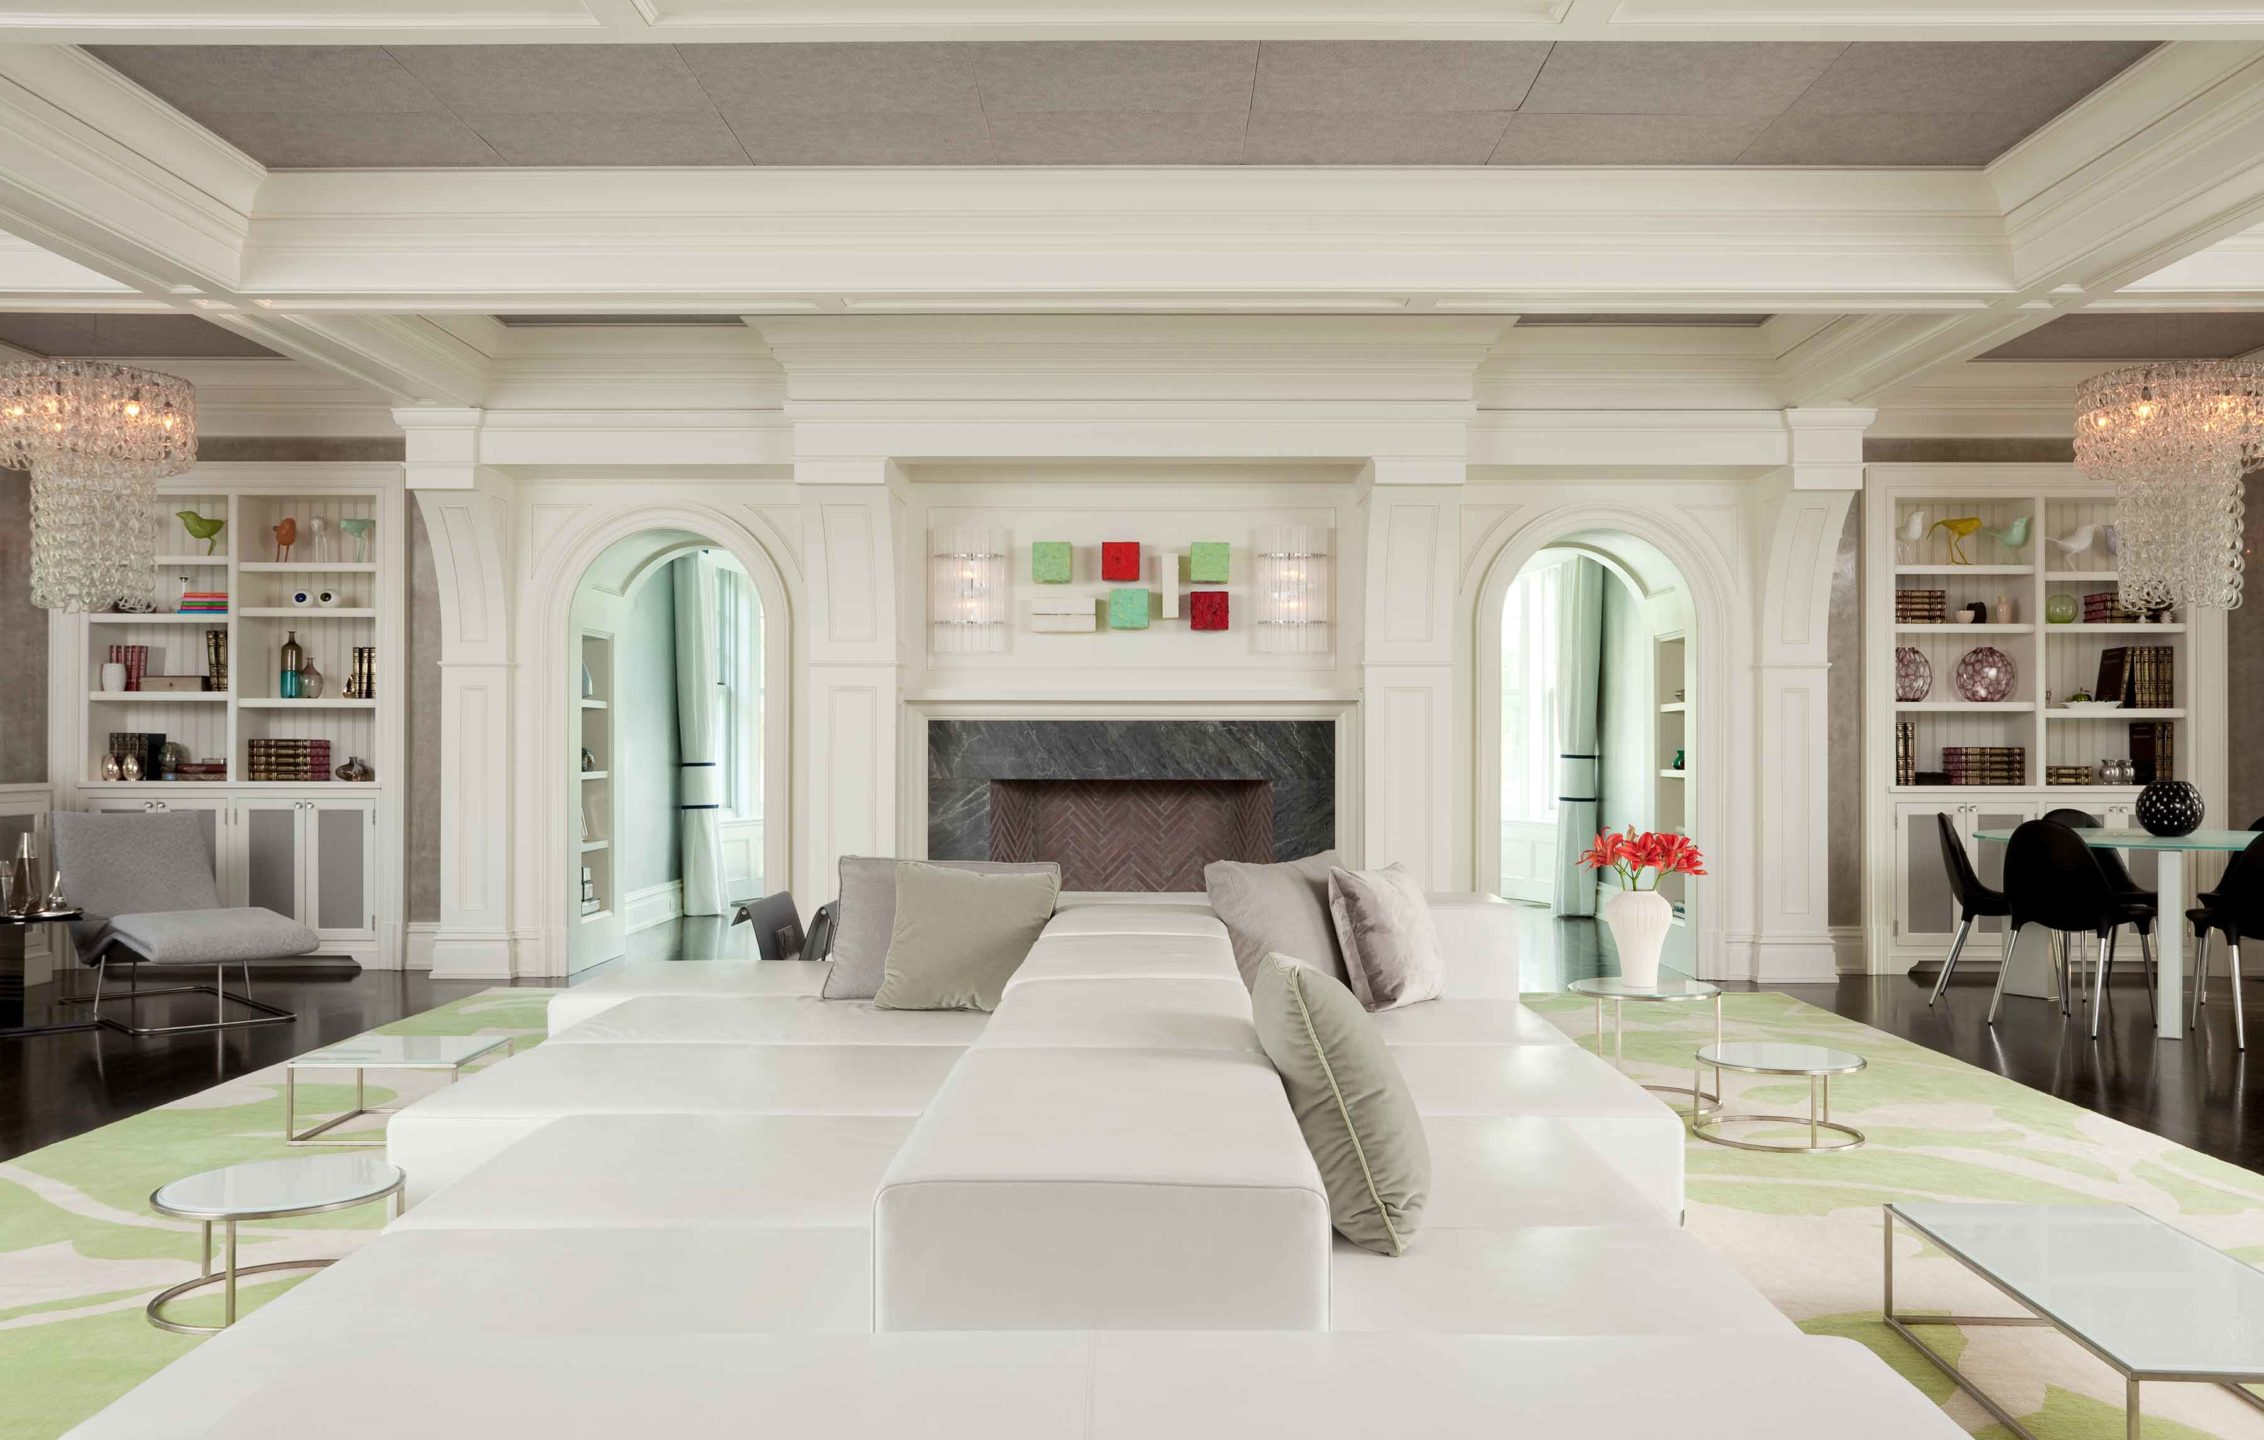 Nicole-Fuller-Interiors-Dutchess-Suffern-Estate-white-living-room-new-york-interior-designer